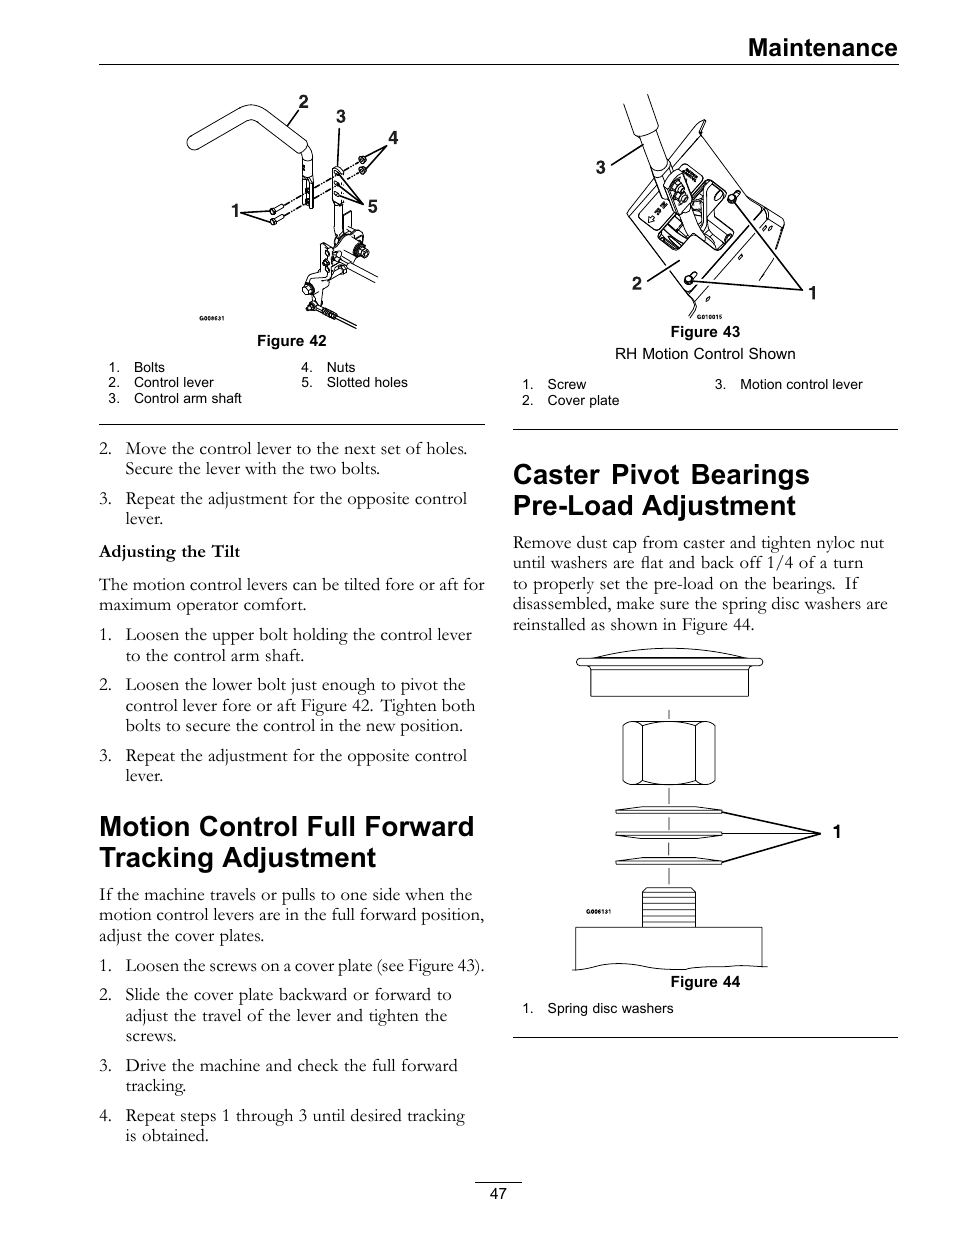 Motion control full forward tracking, Adjustment, Caster